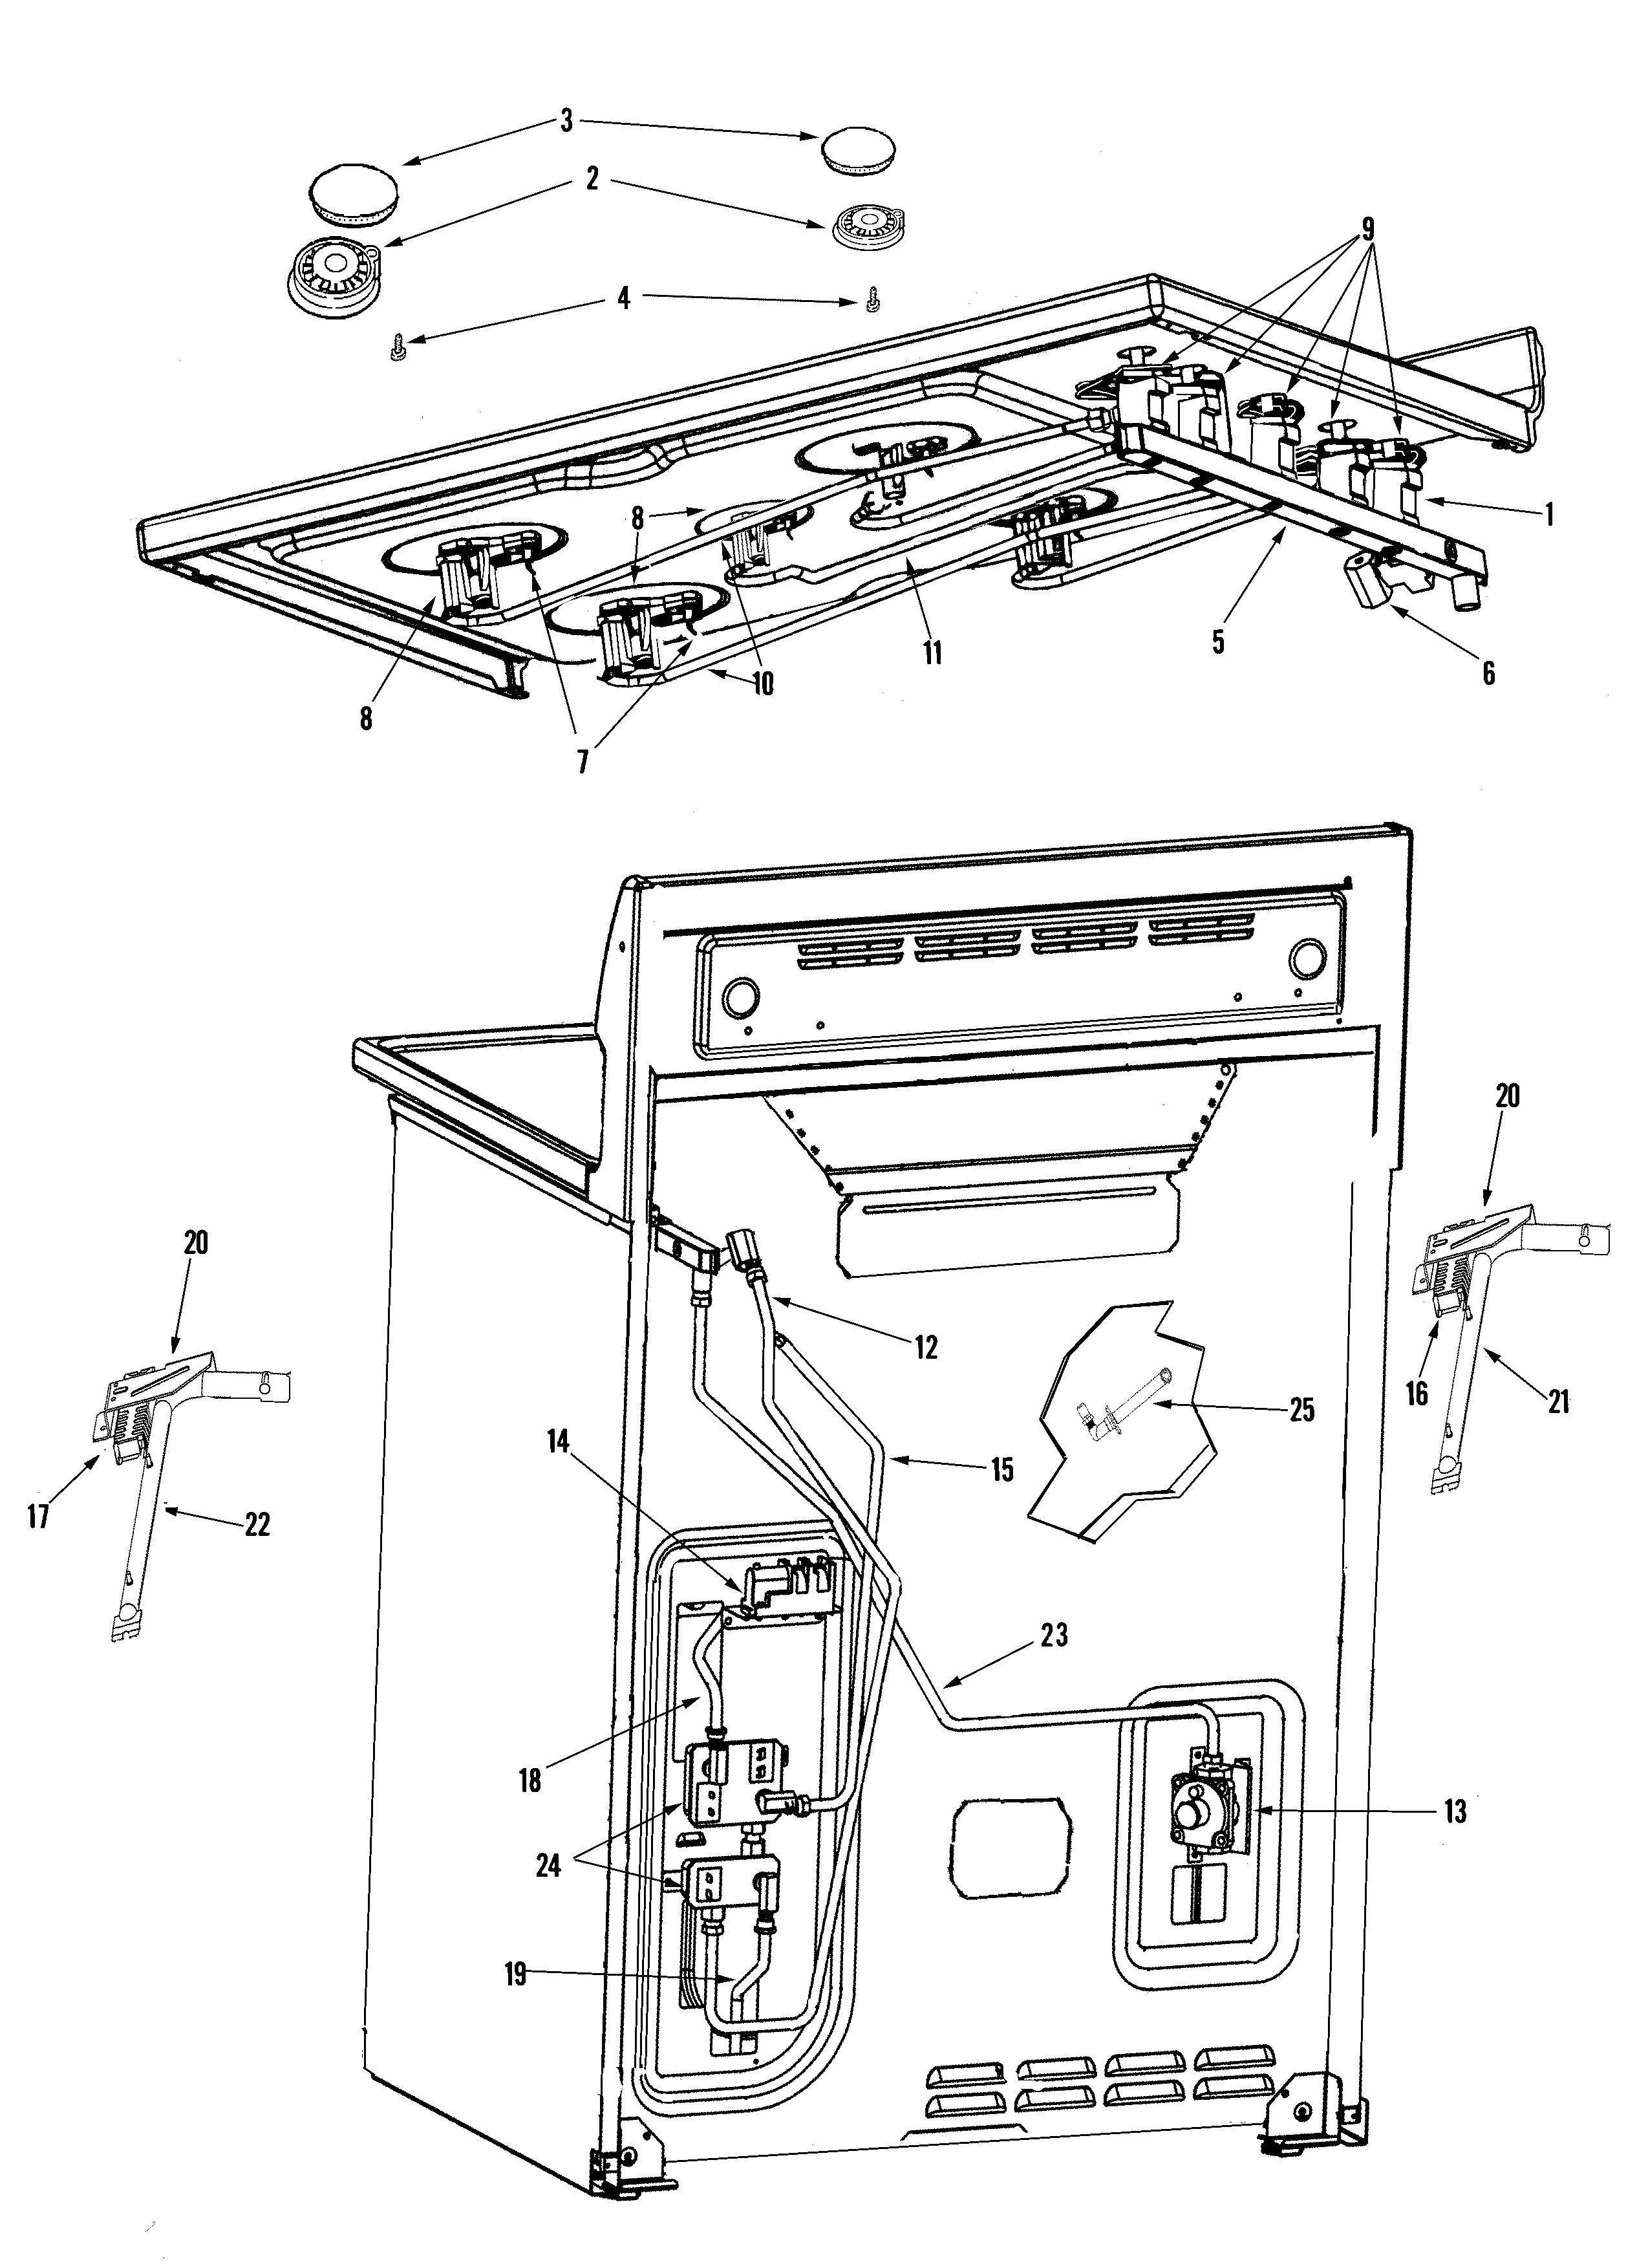 maytag mgr6875adb gemini 30 u0026quot  double oven freestanding gas